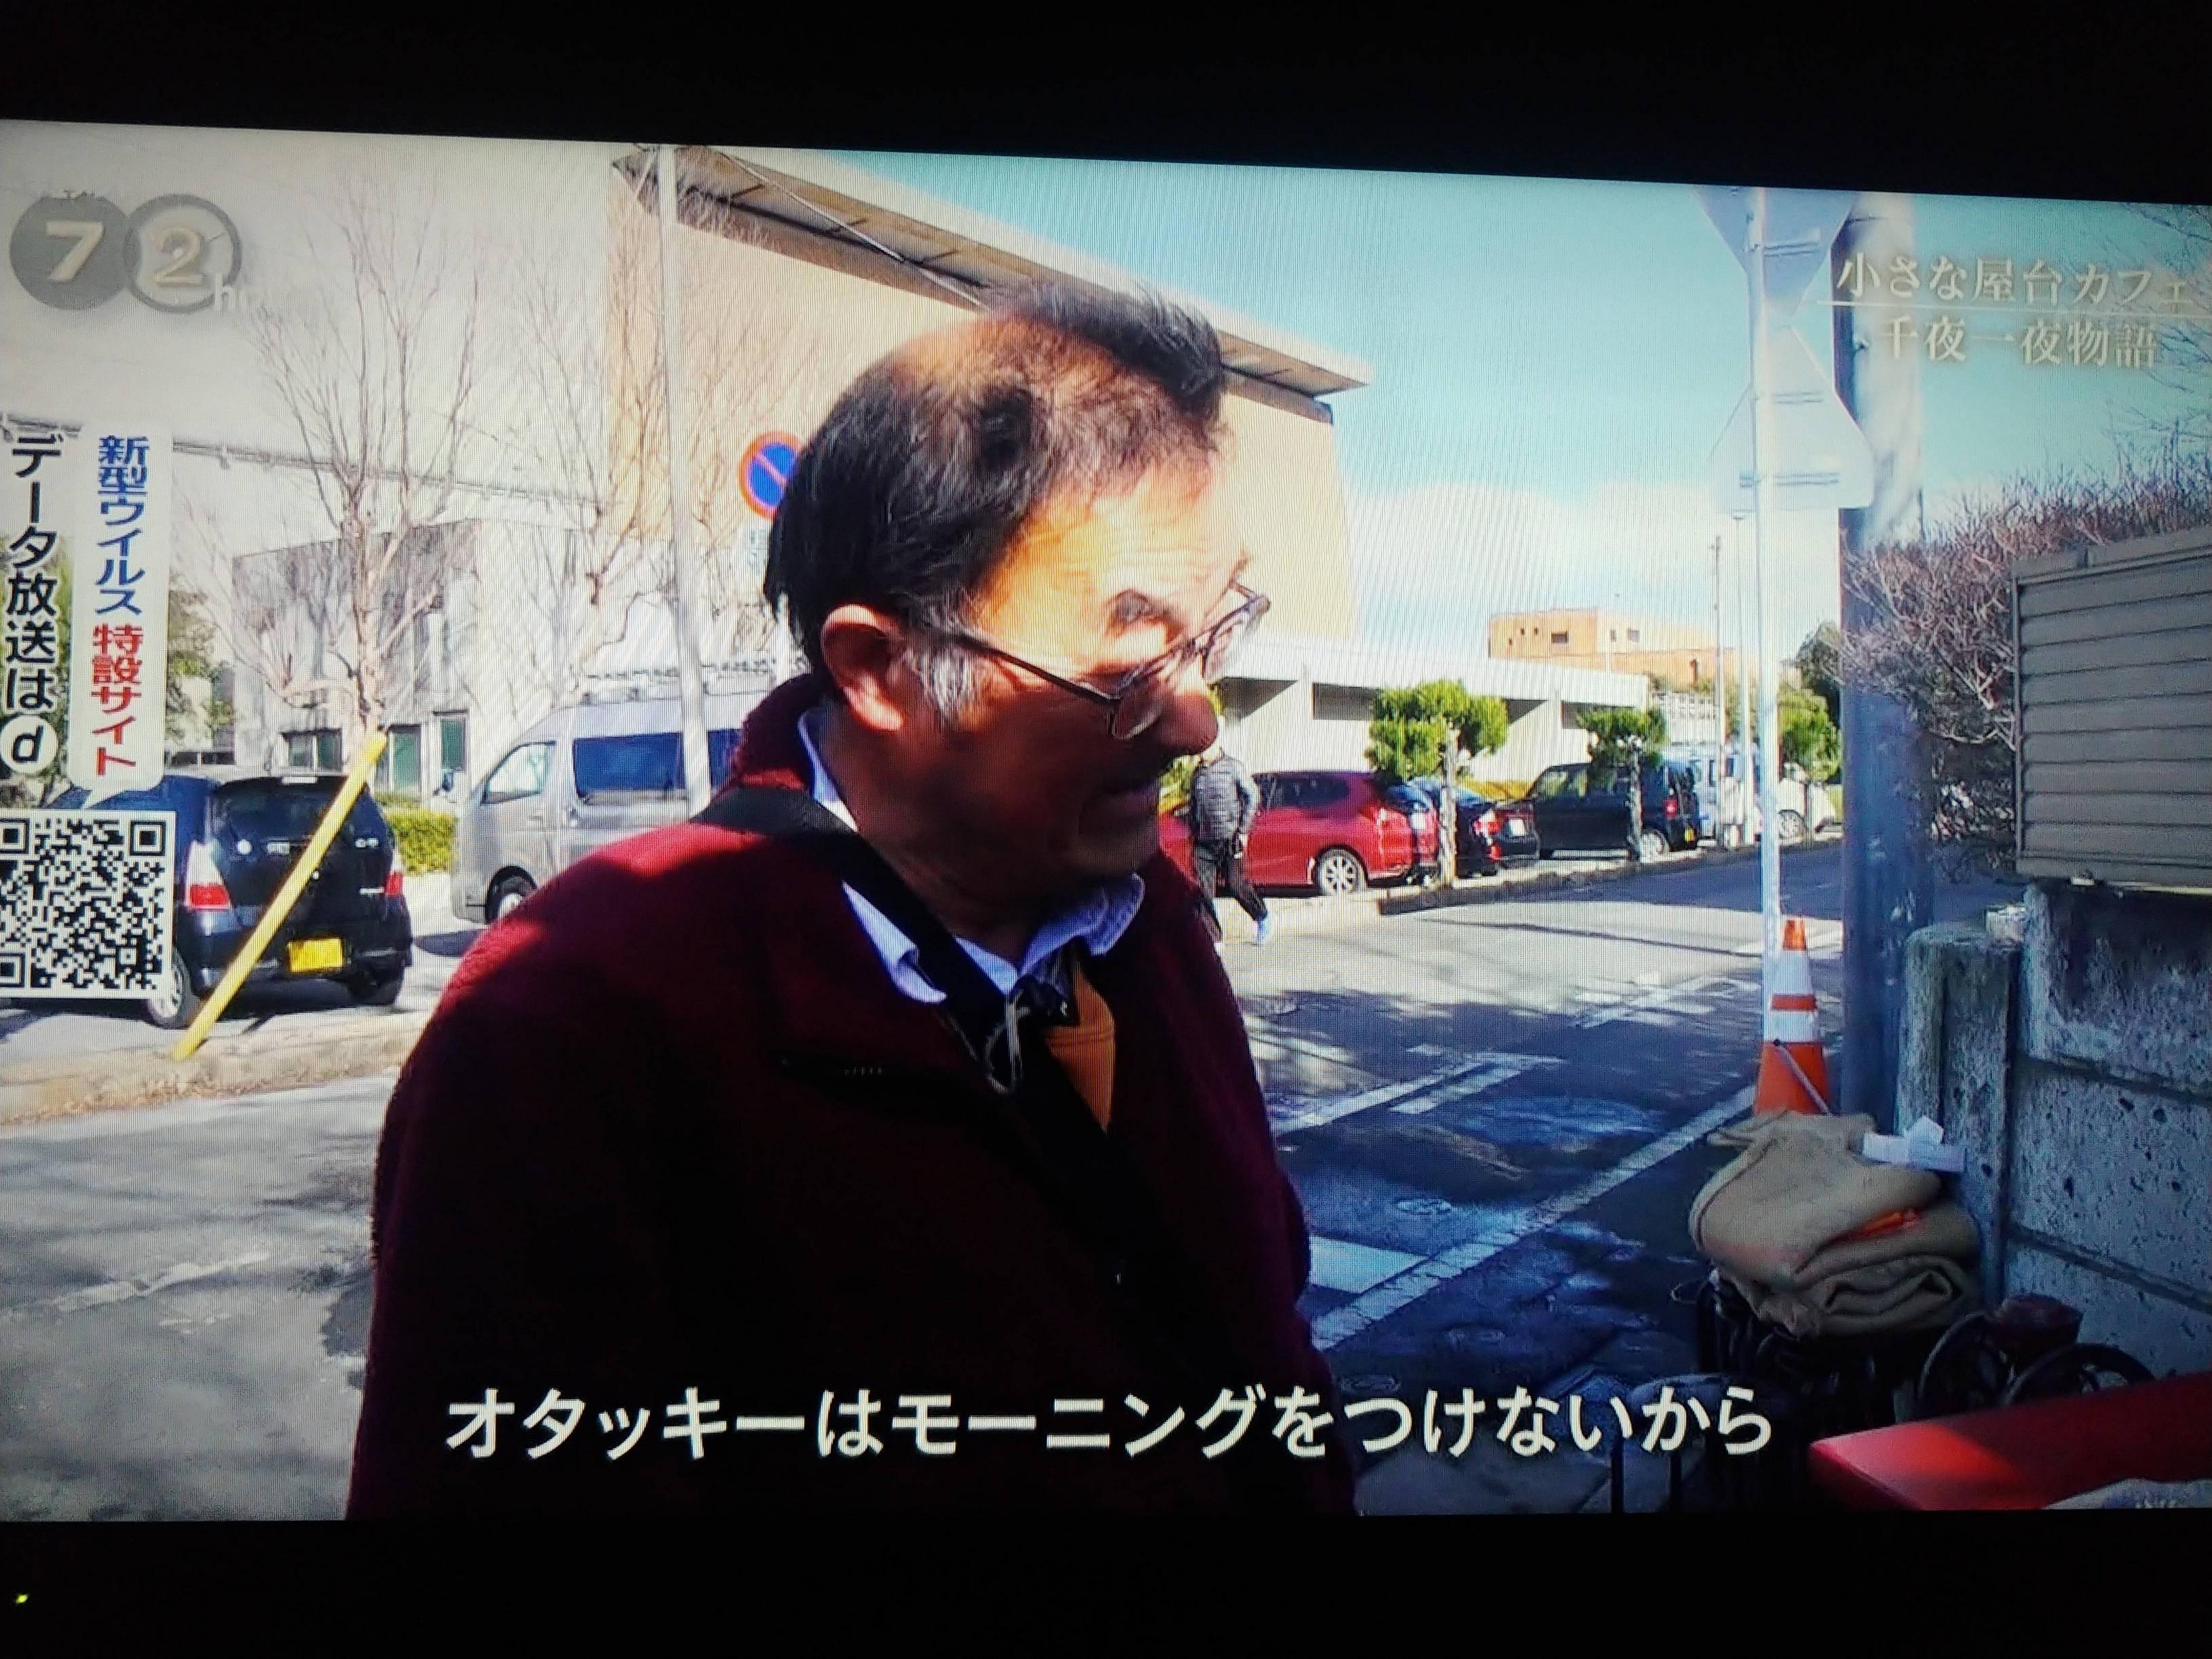 http://www.mybitchisajunky.com/whg/picture/LsfE2gS_5e6479b167fc3.jpg